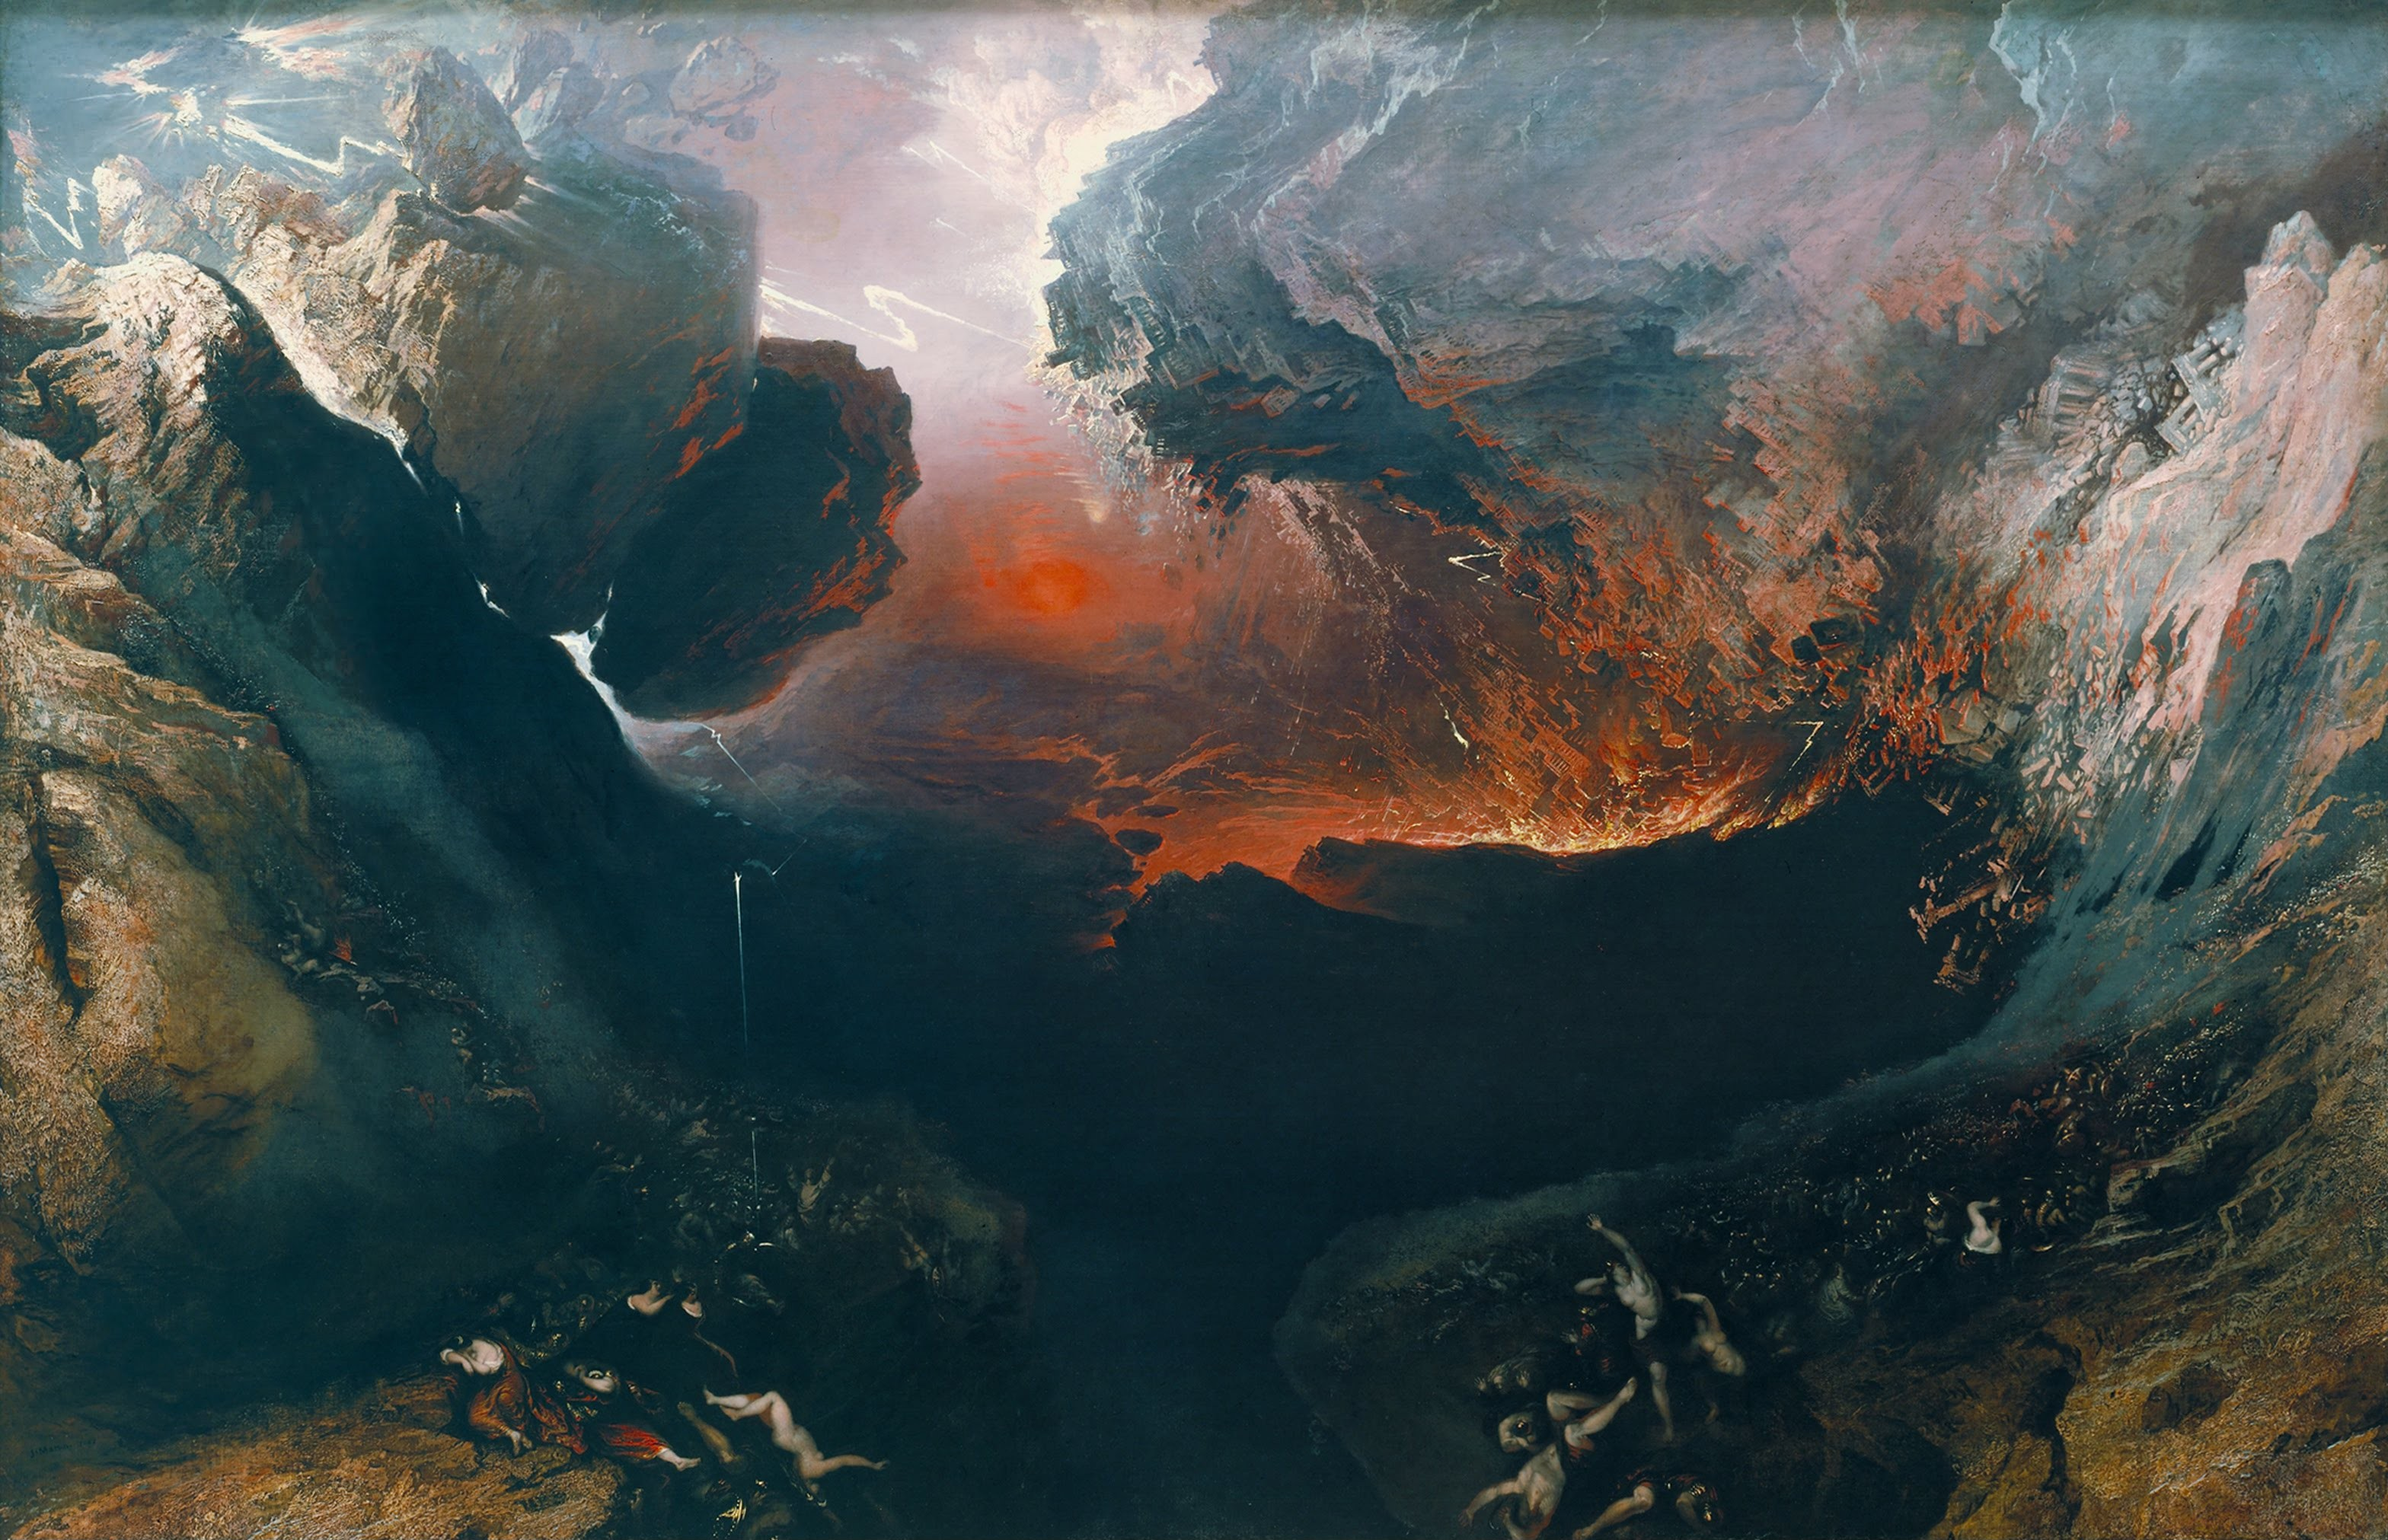 pintura de john martin descrevendo o apocalipse (Foto: wikimedia commons)